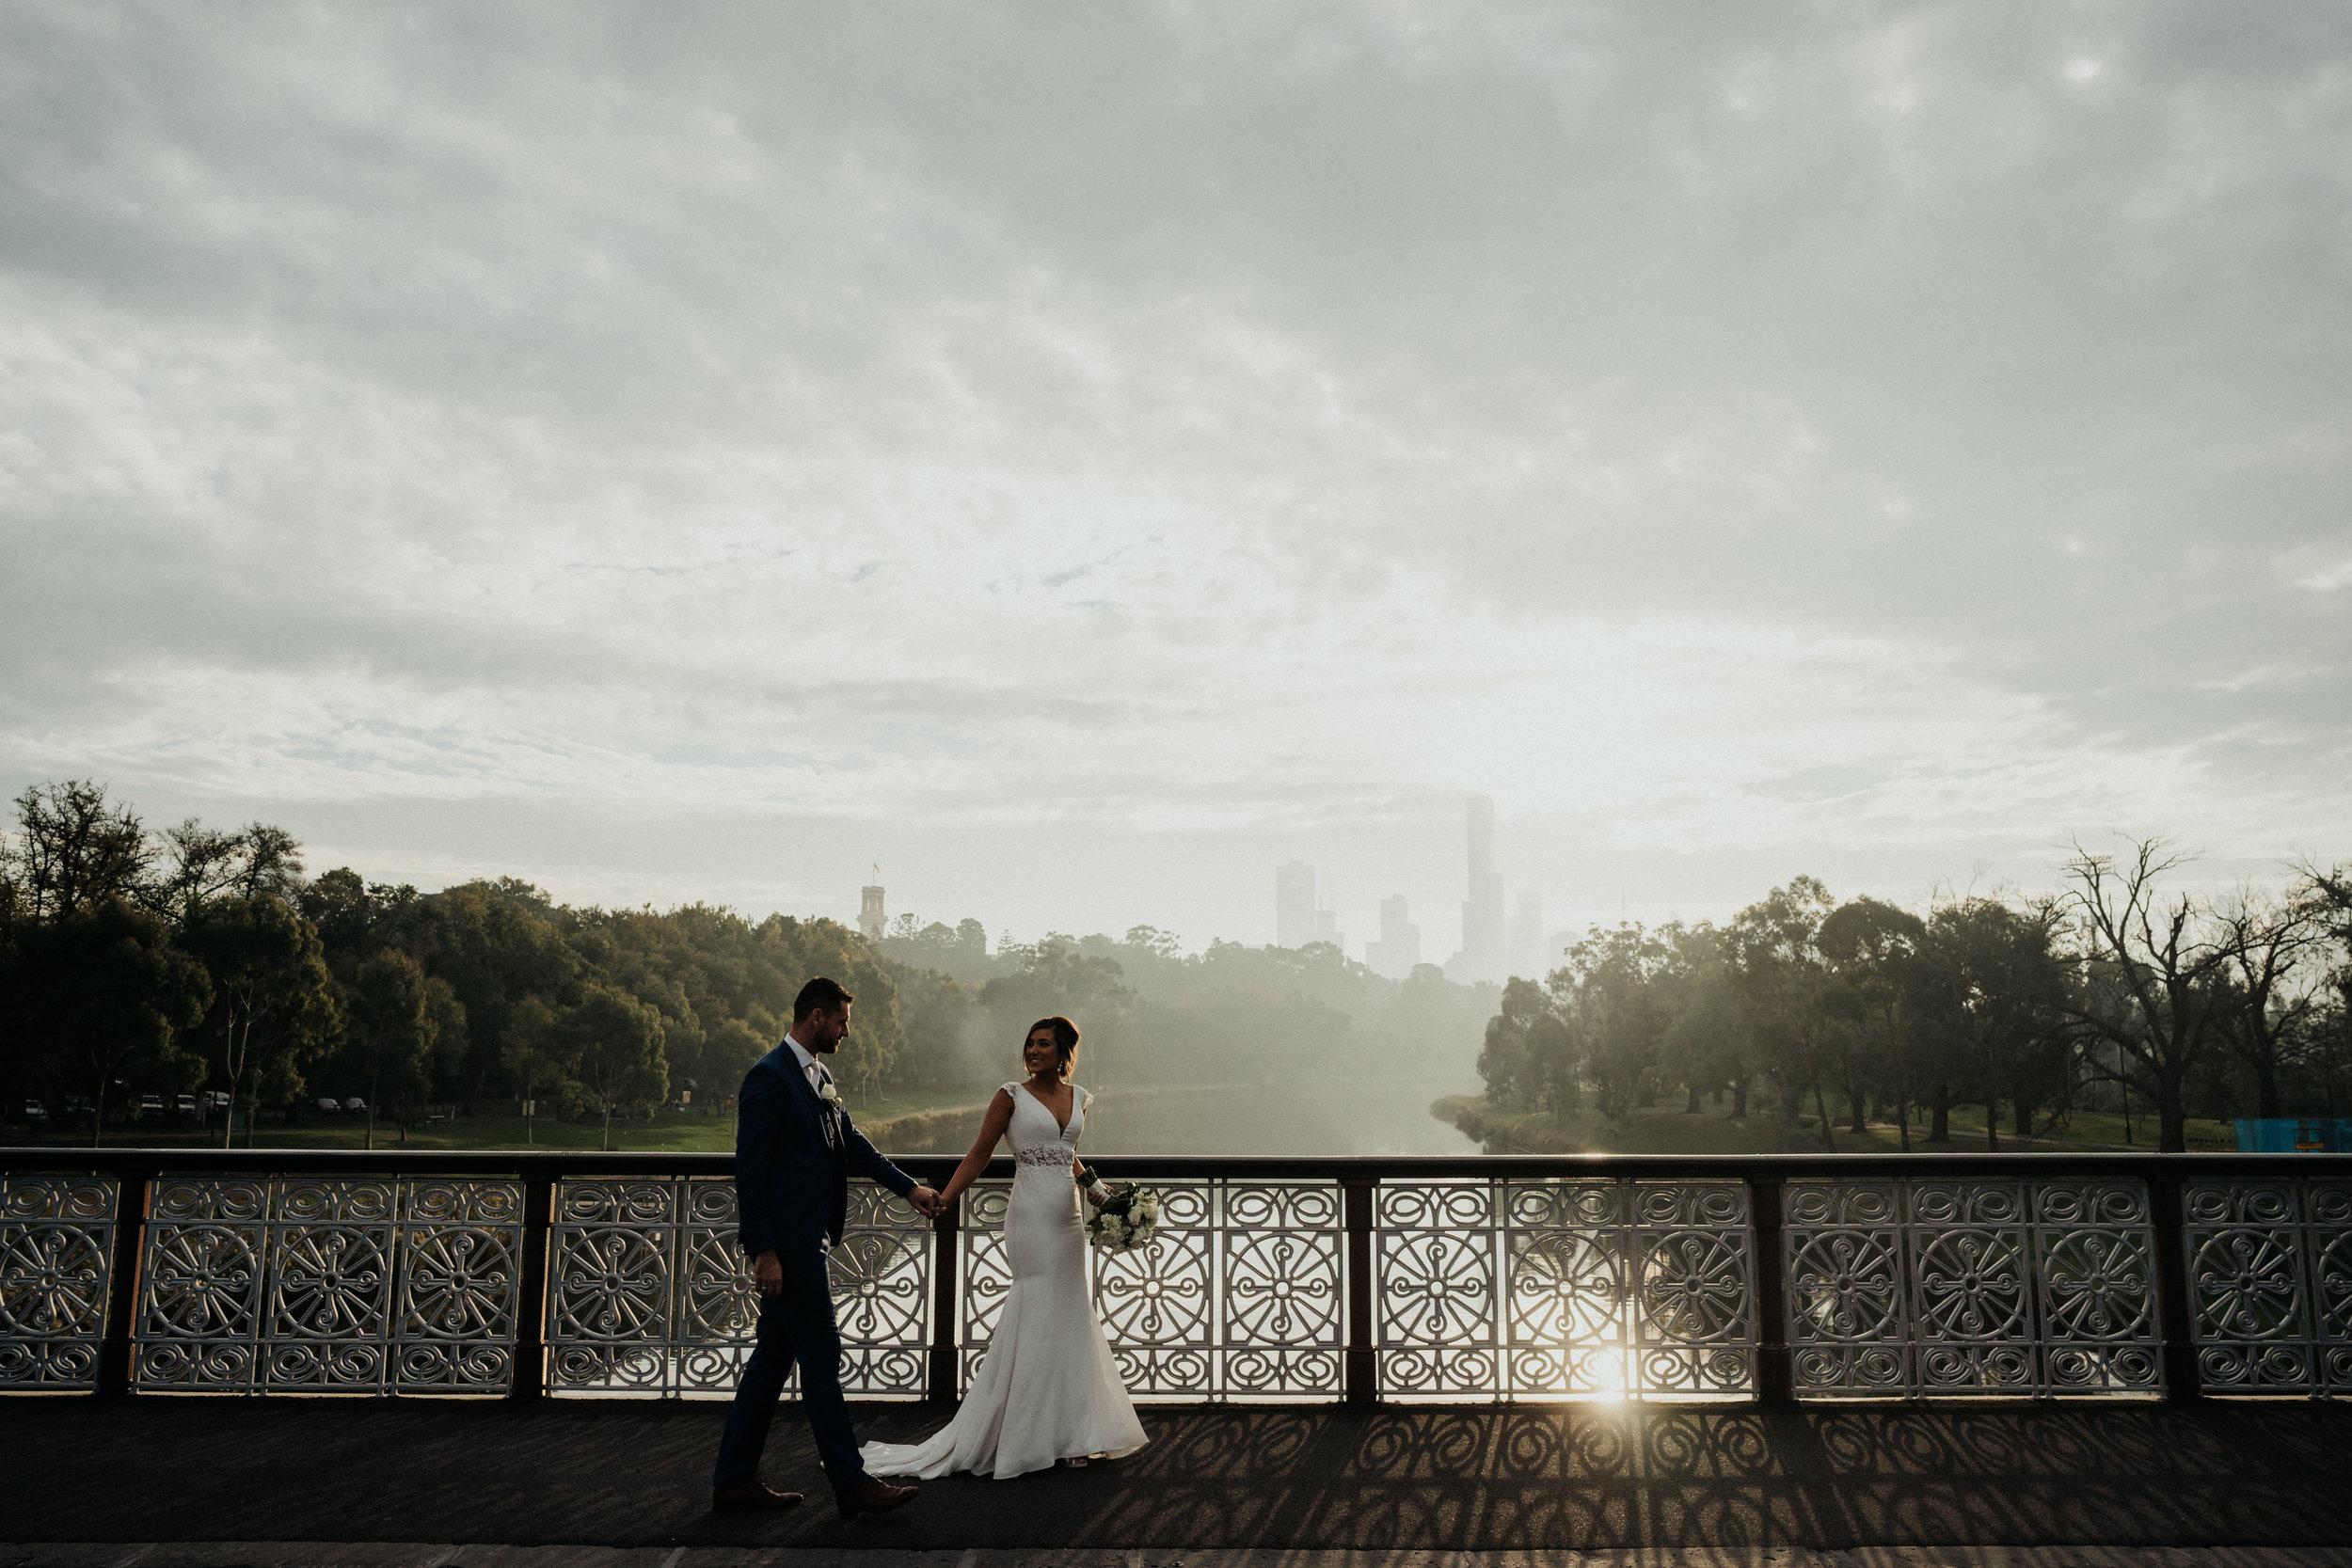 Aleksandra-Mladen-Wedding-Andy-452.jpg